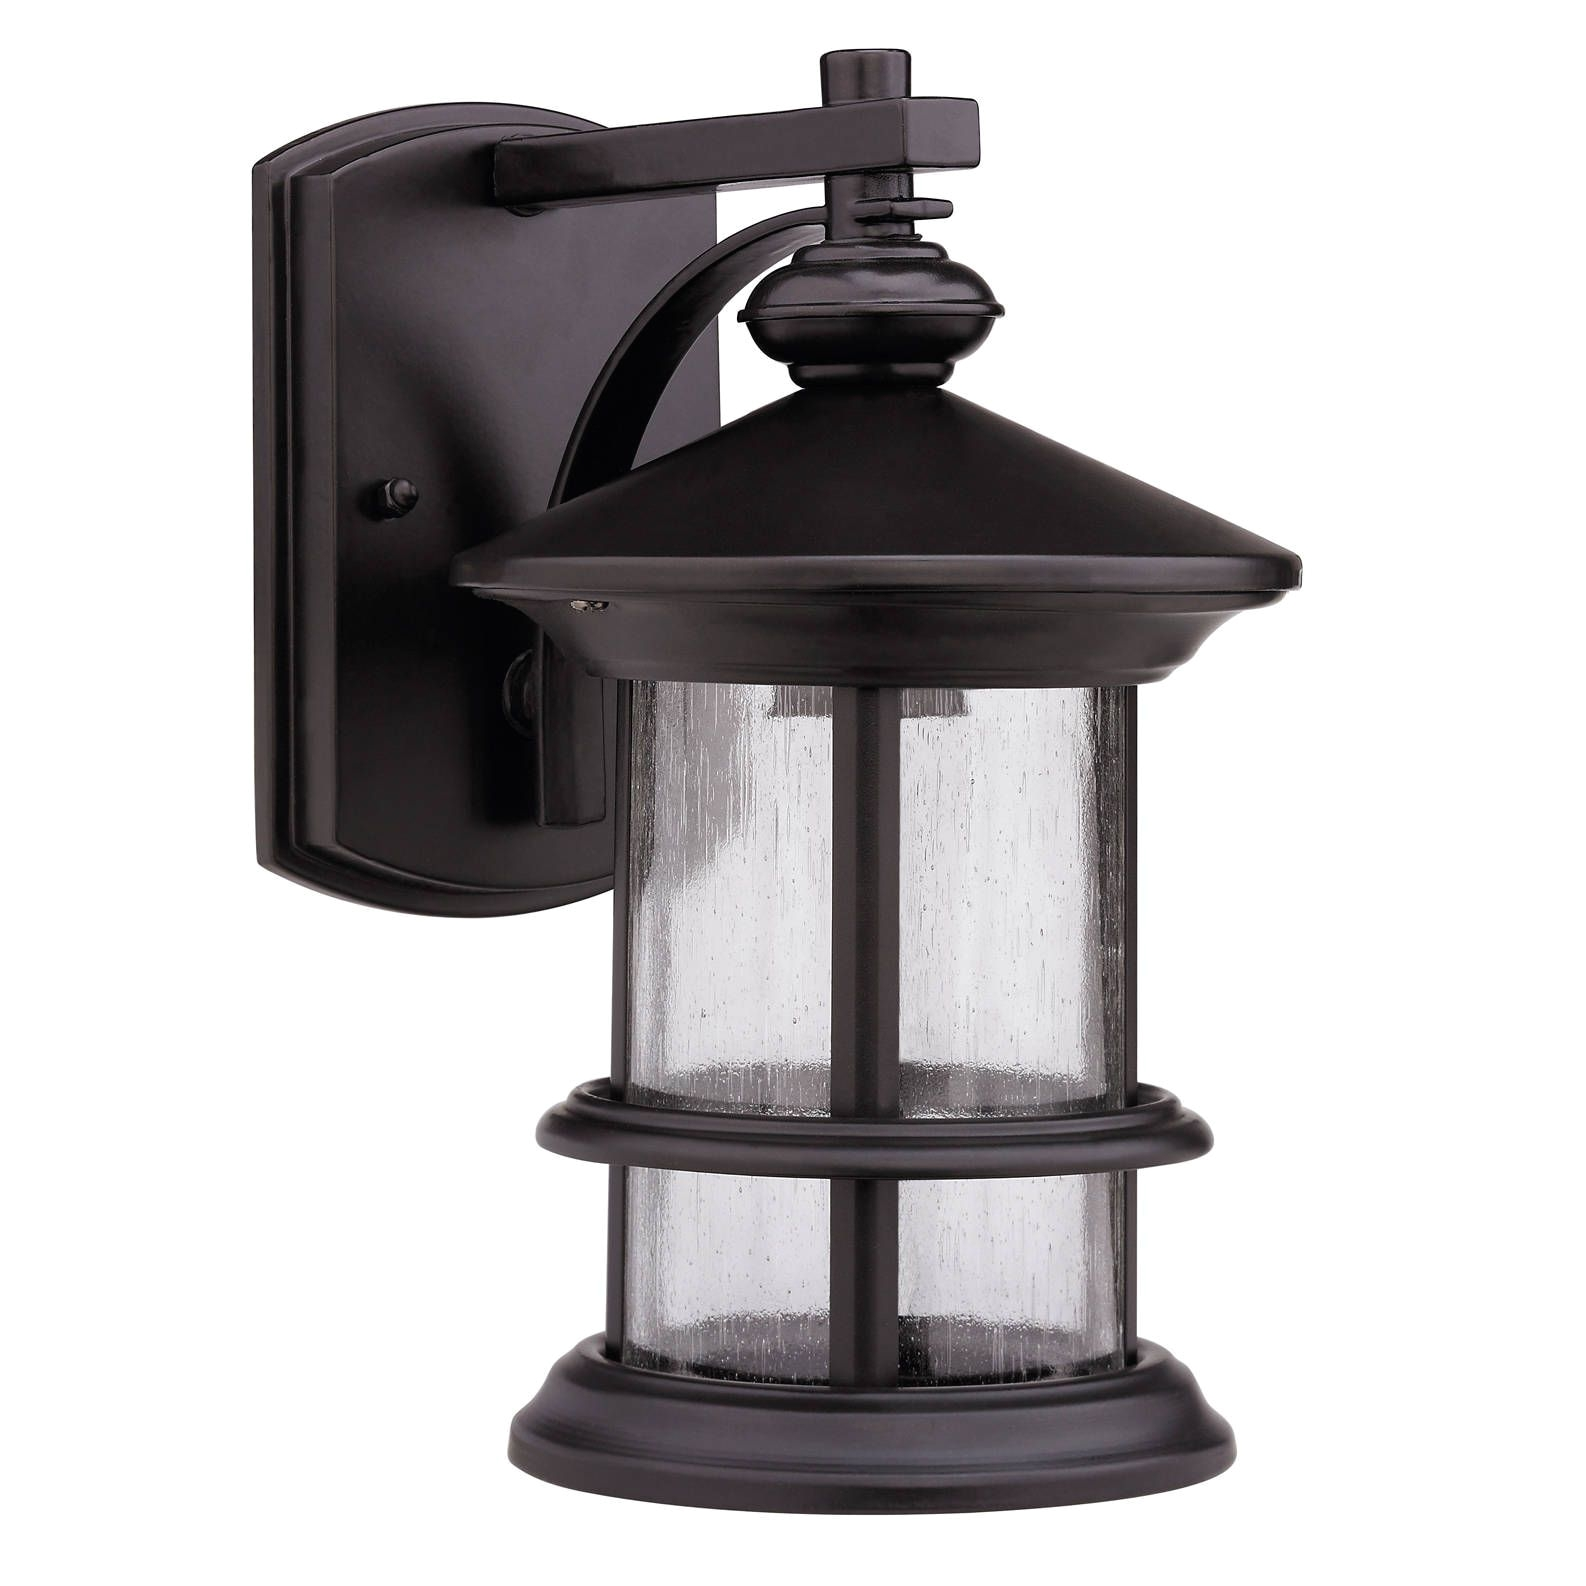 chloe rubbed dark bronze 1 light outdoor wall mounted light fixture brown